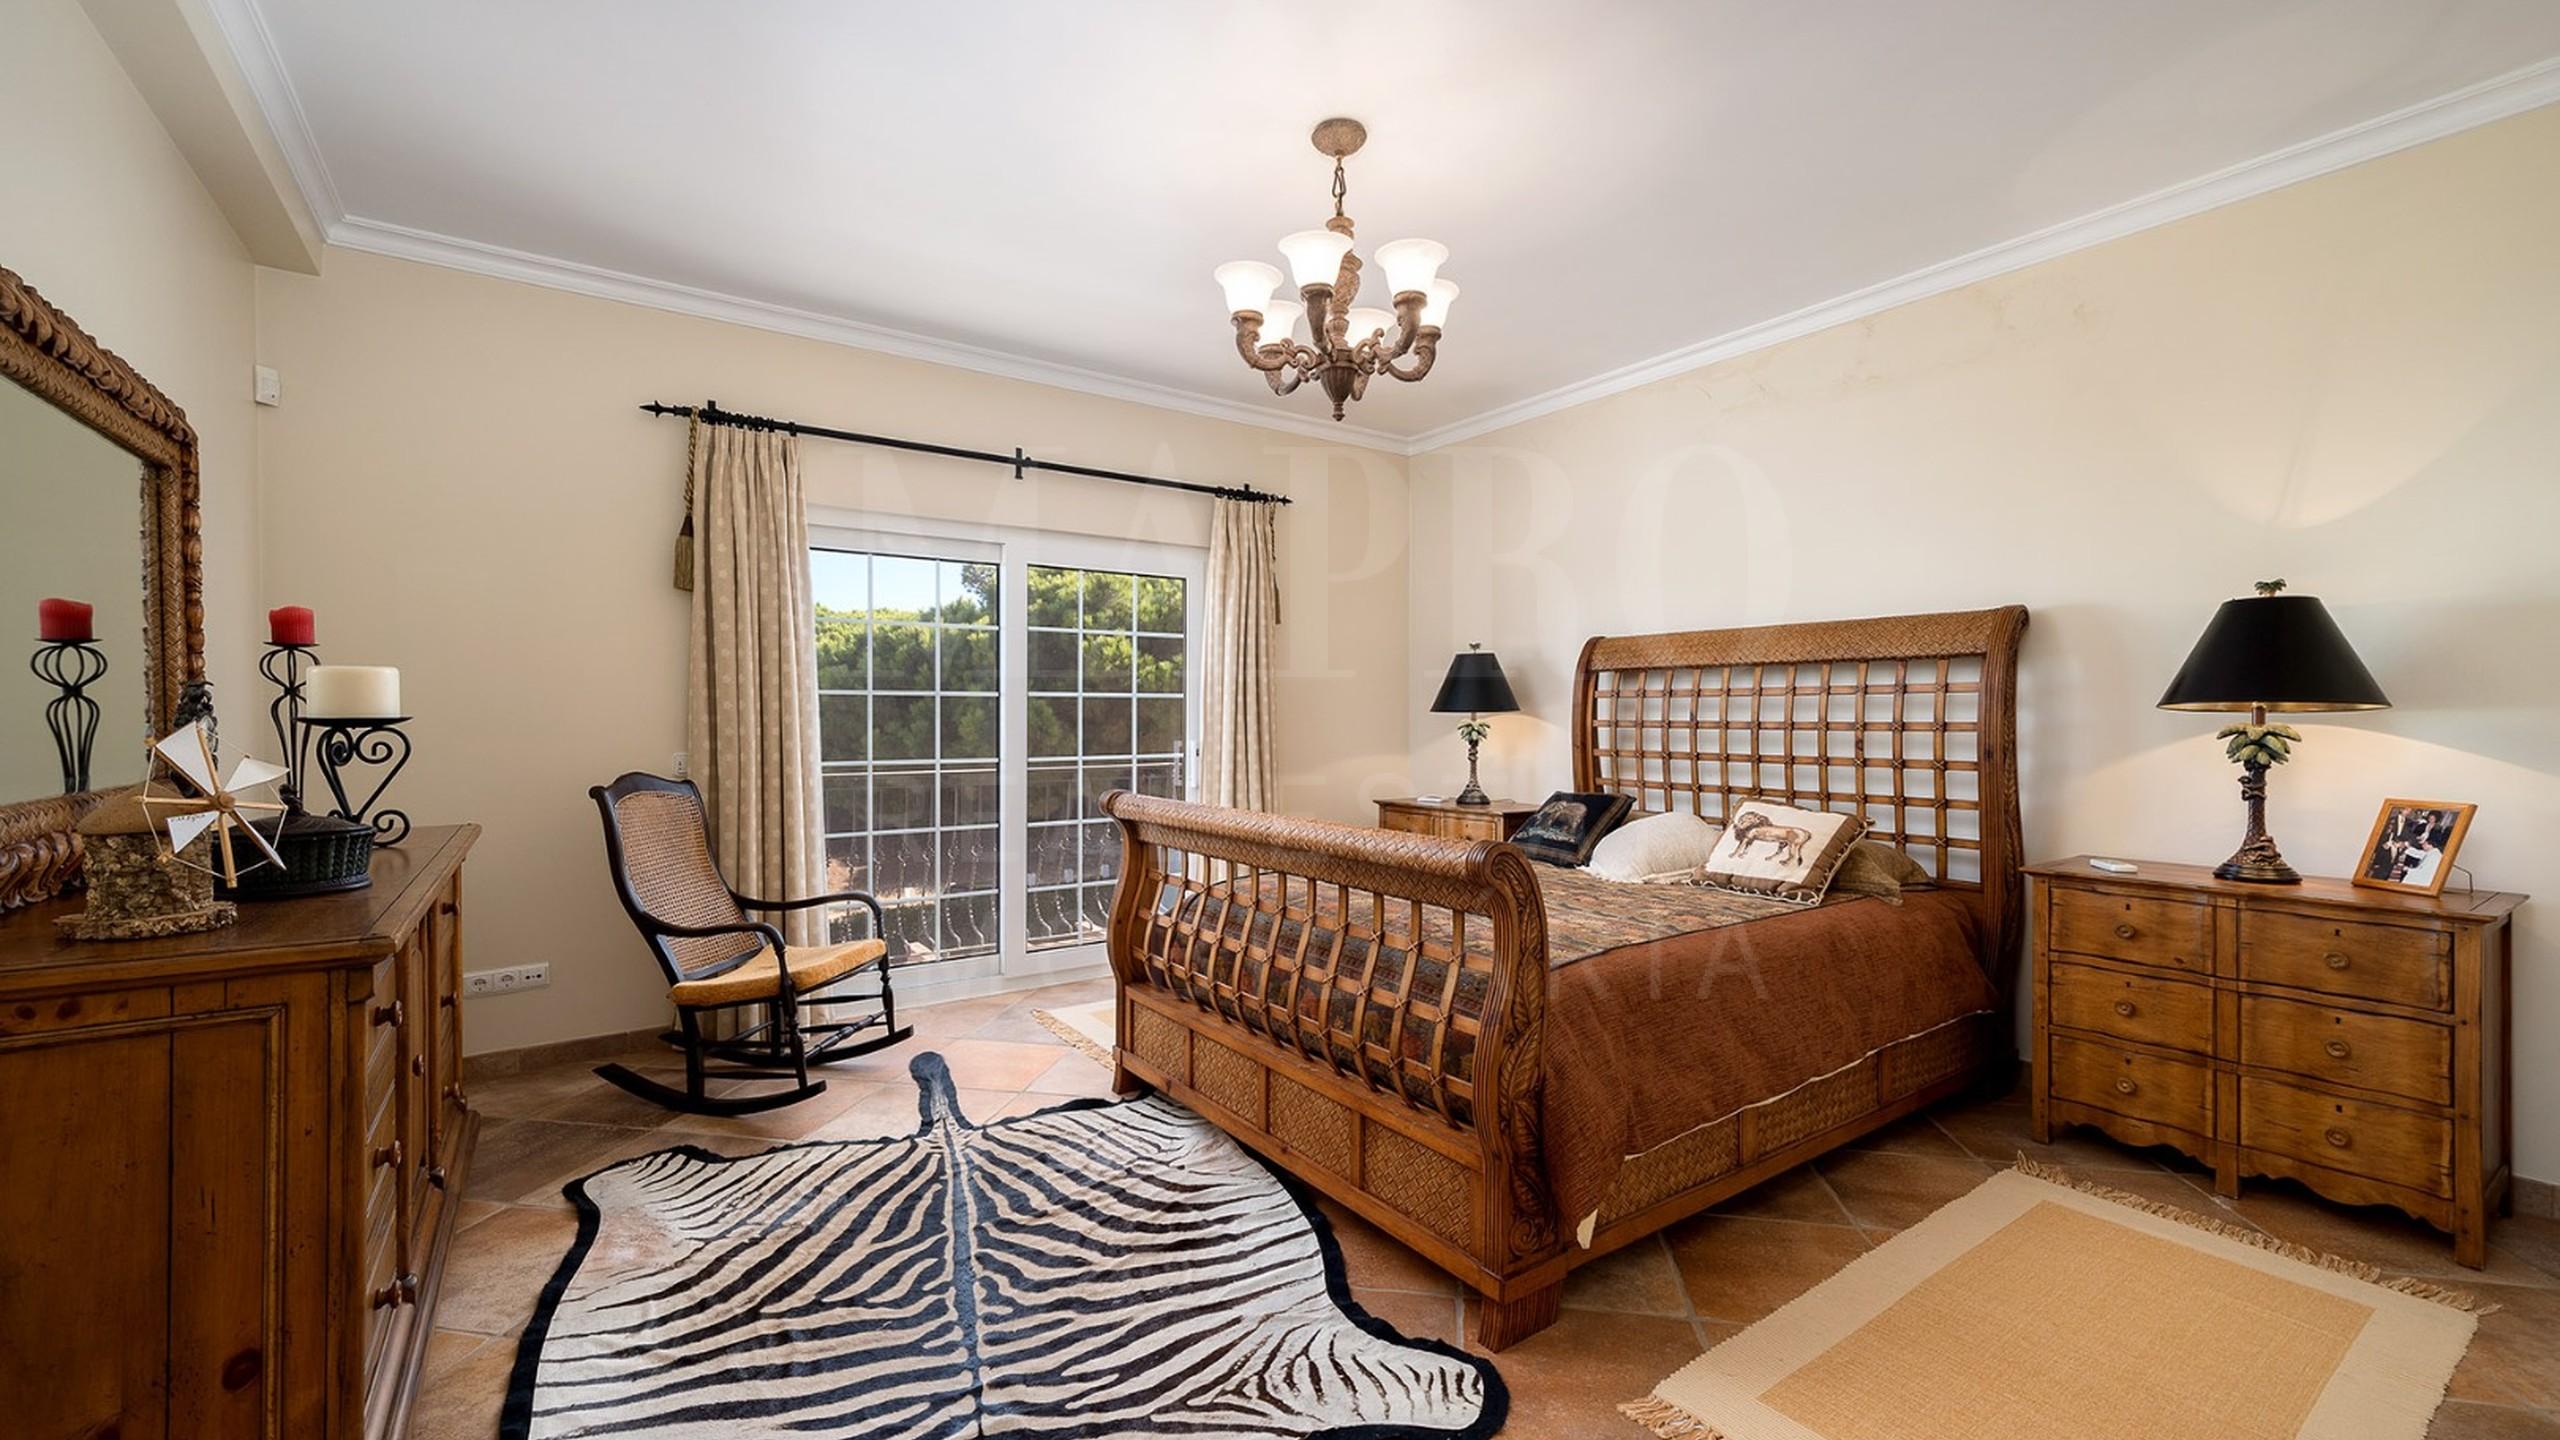 Chambre avec lit kingsize